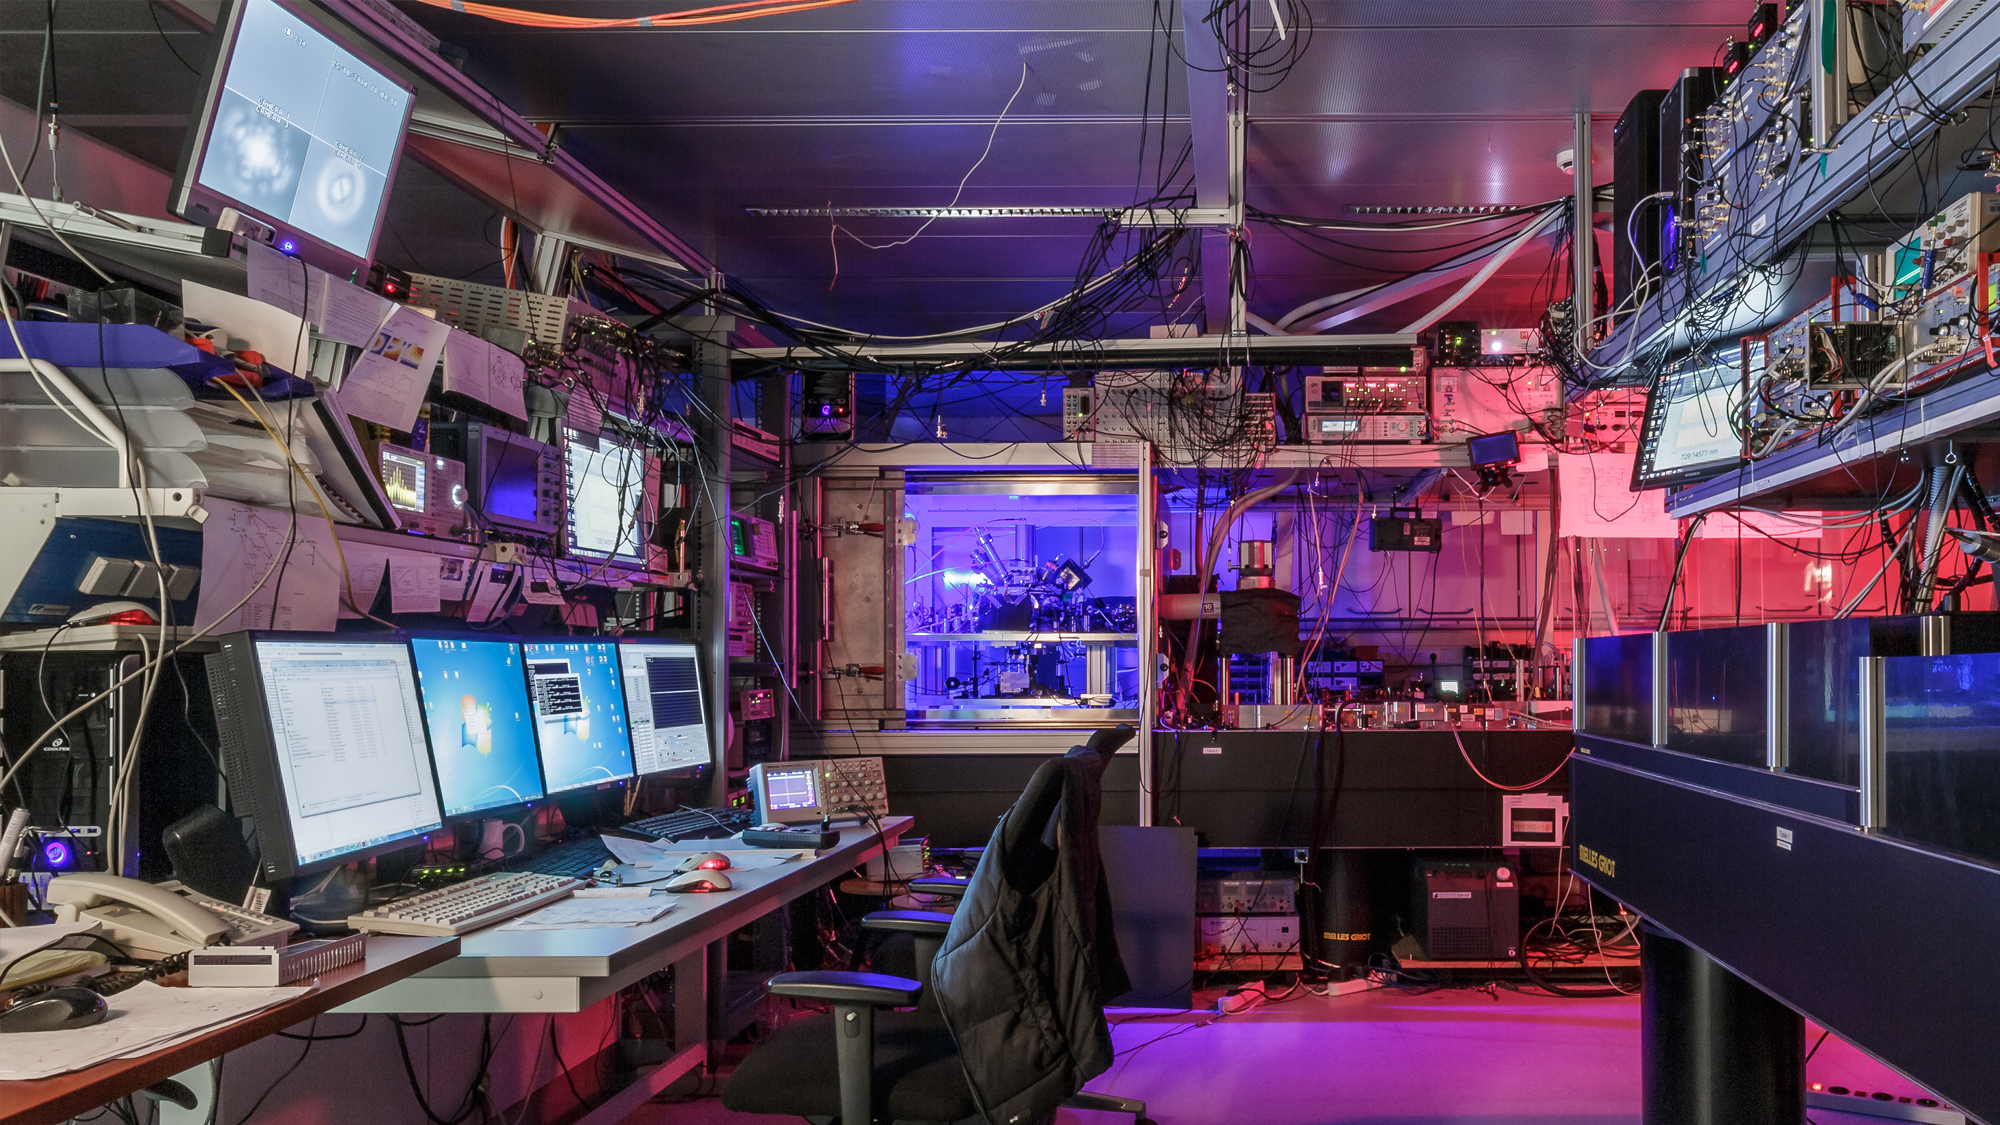 Alpine Quantum Technologies: Innsbrucker Quantencomputer-Spin-off bekommt 10 Mio. Euro | TrendingTopics.at